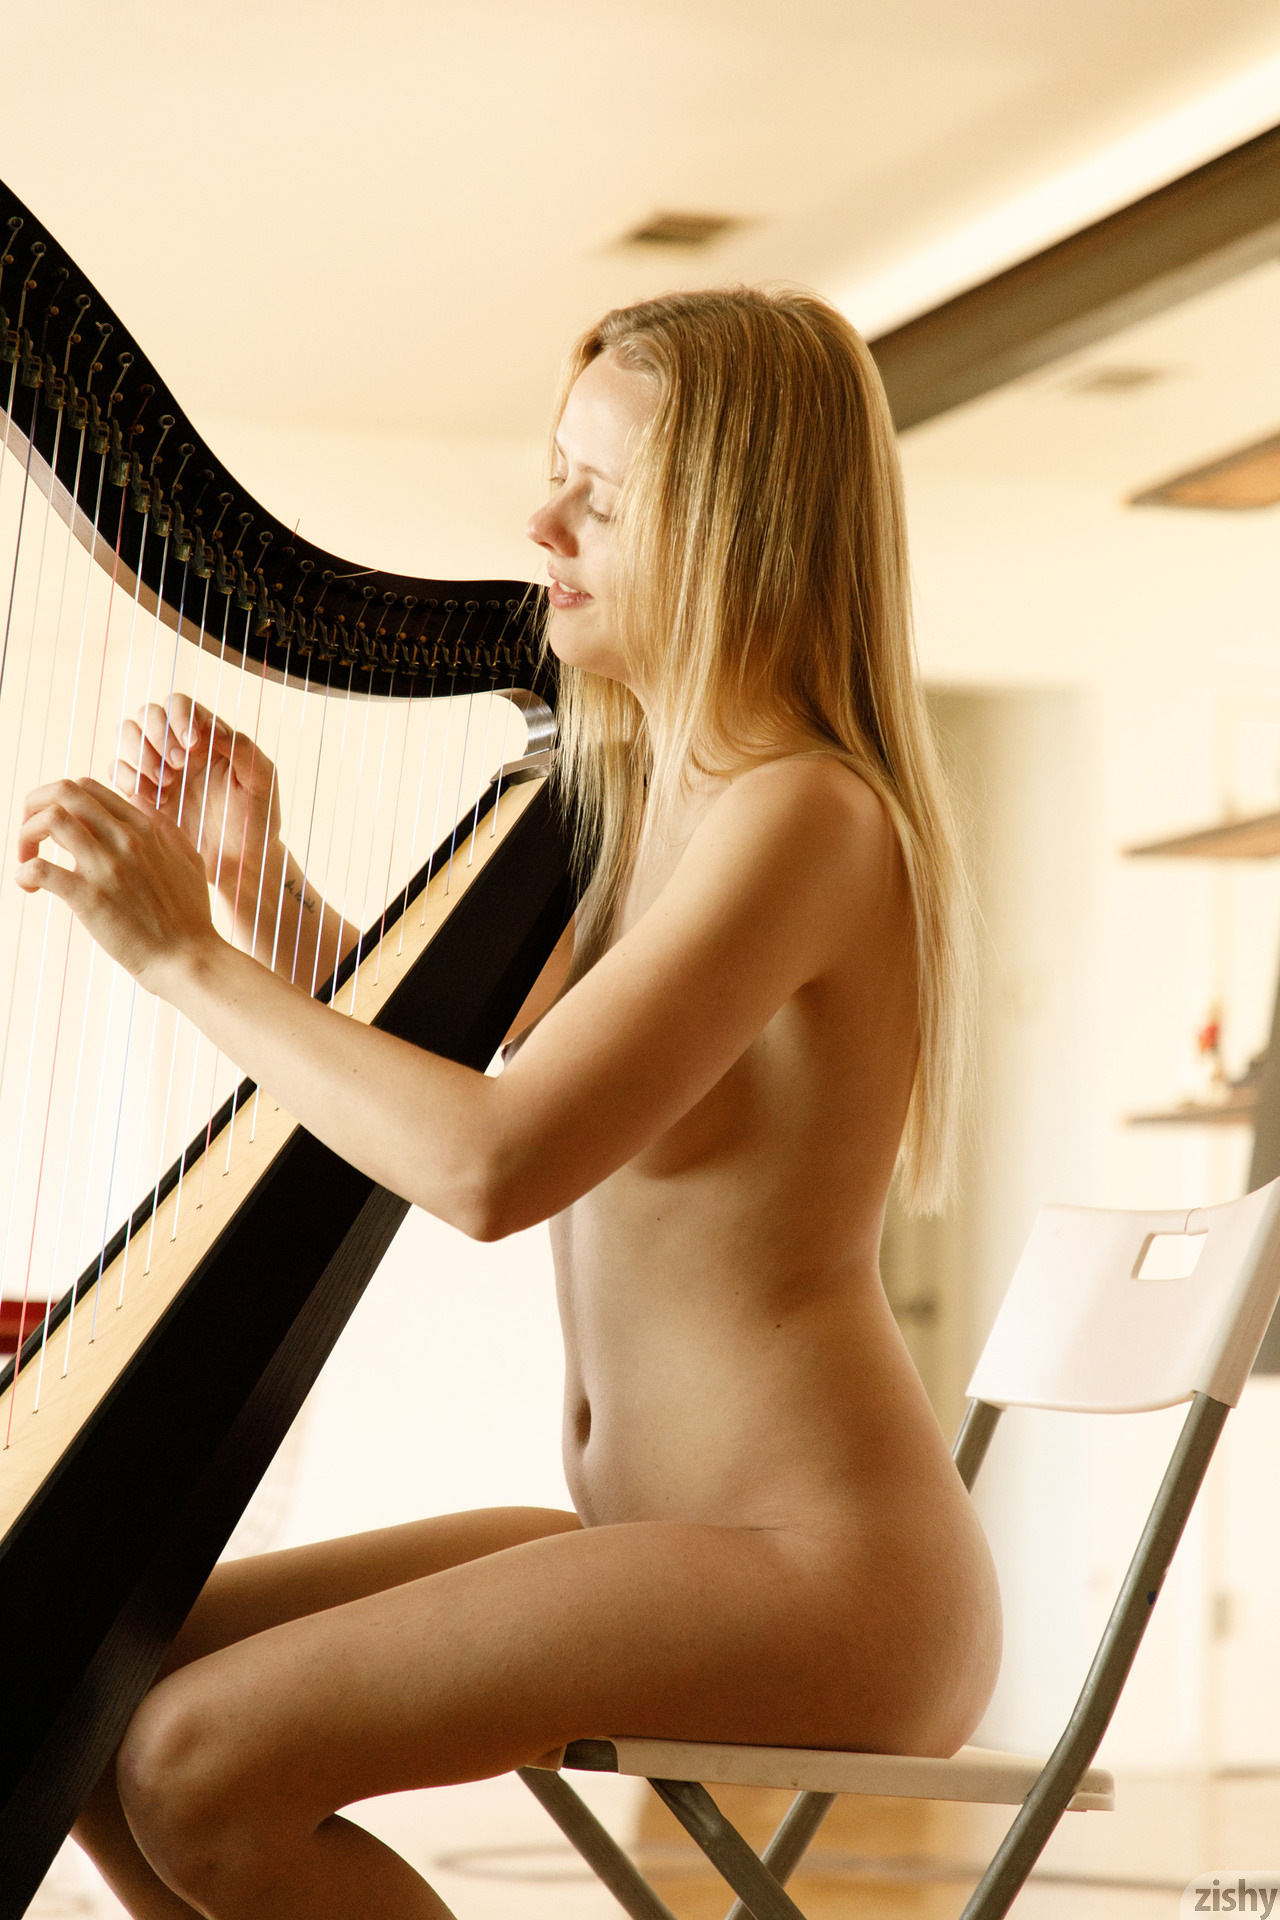 Helen Bergstrom Show Me Your Strings Zishy (26)